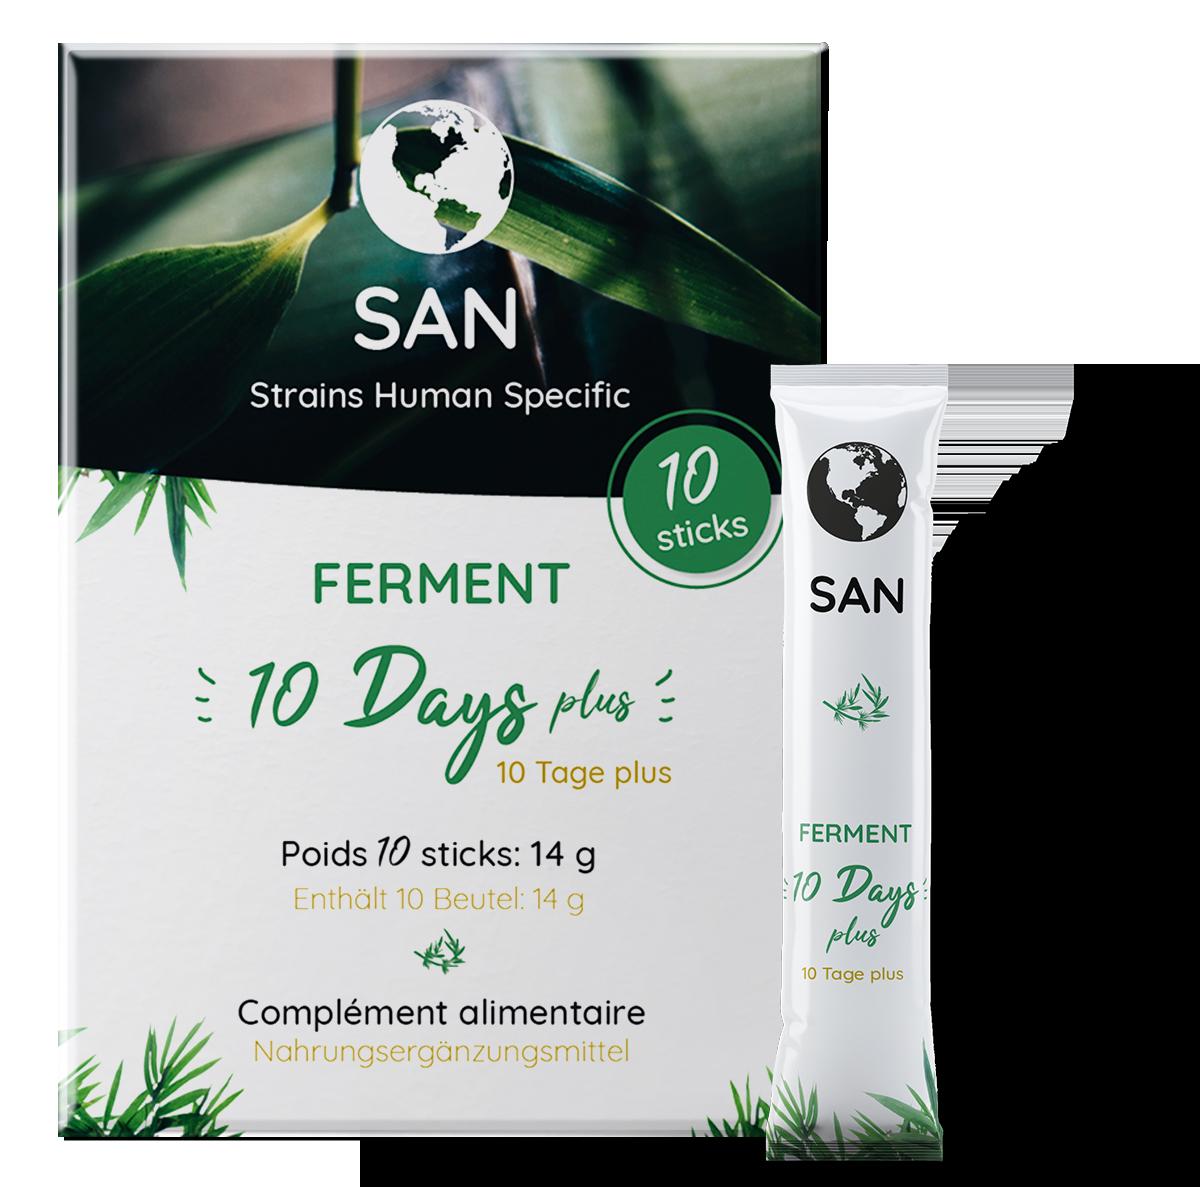 ferment-10-days-plus-box-stick